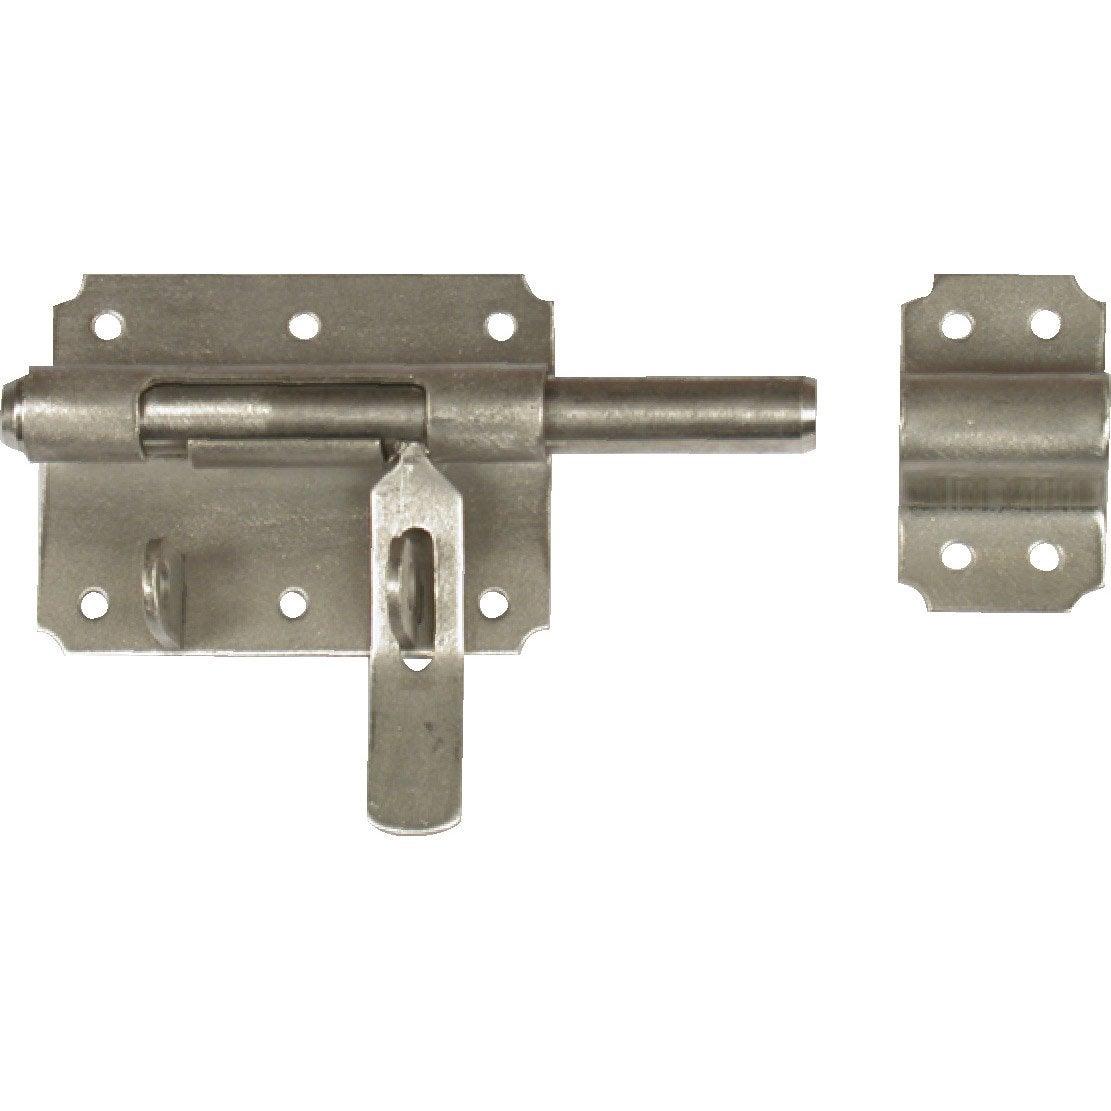 Verrou de box porte cadenas inox brossé, H.70 x L.120 x P.20 mm ...